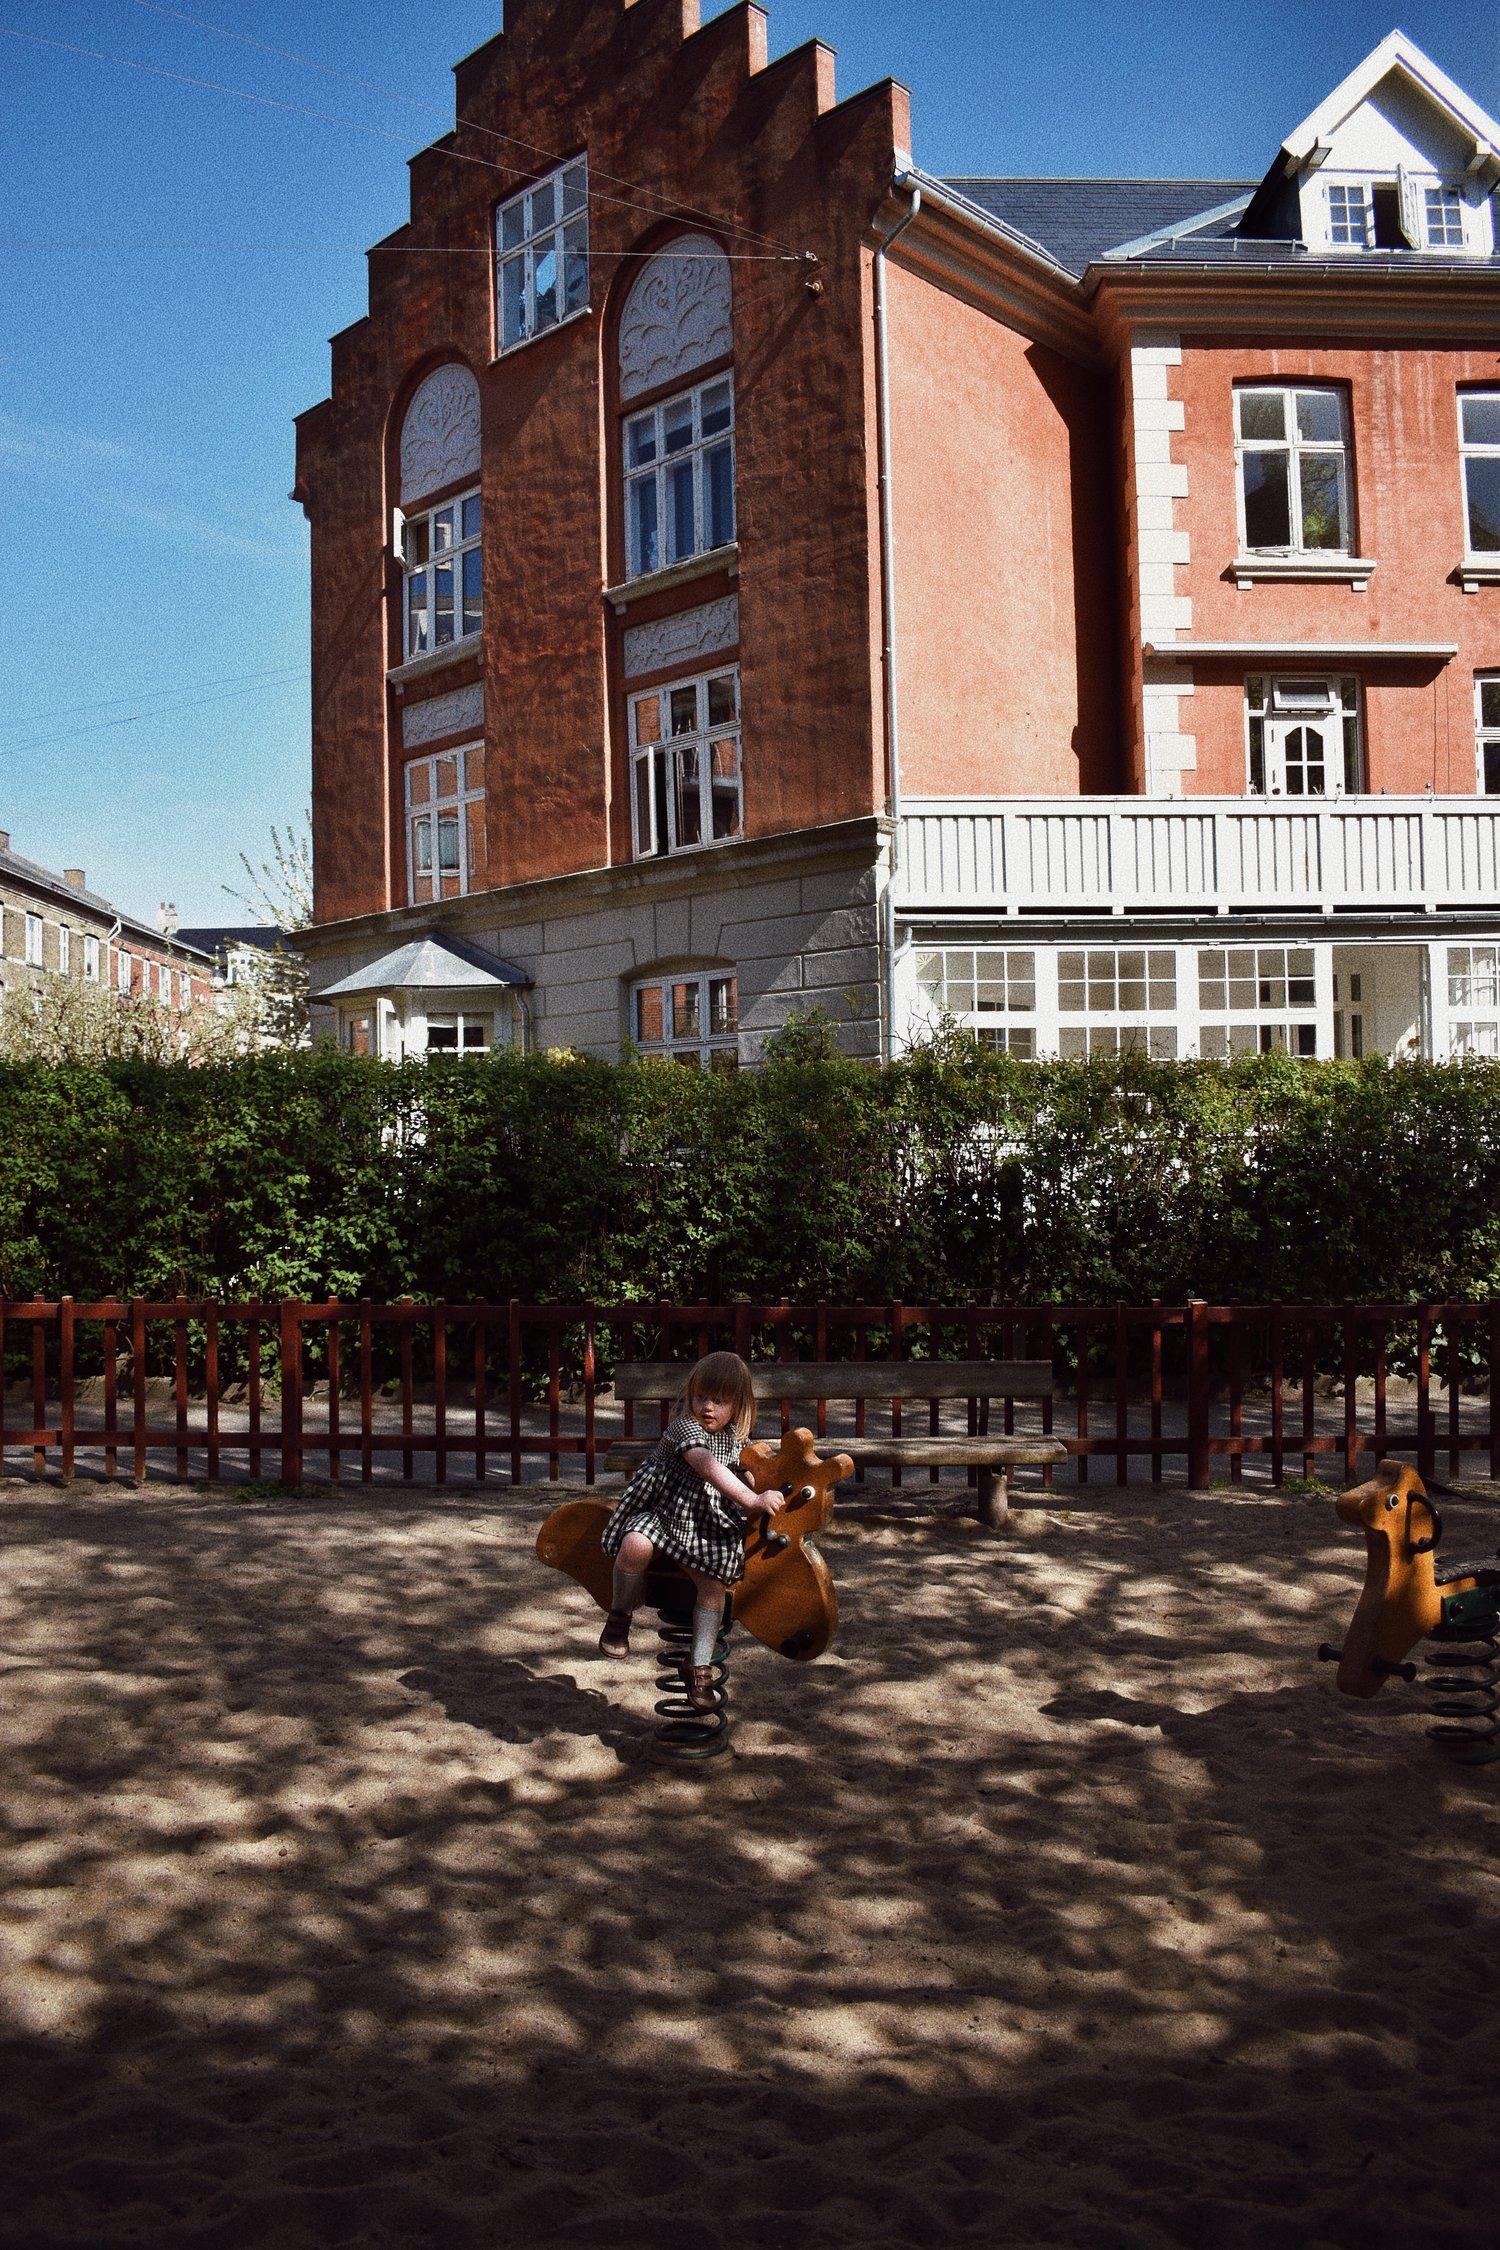 Copenhagen playgrounds!